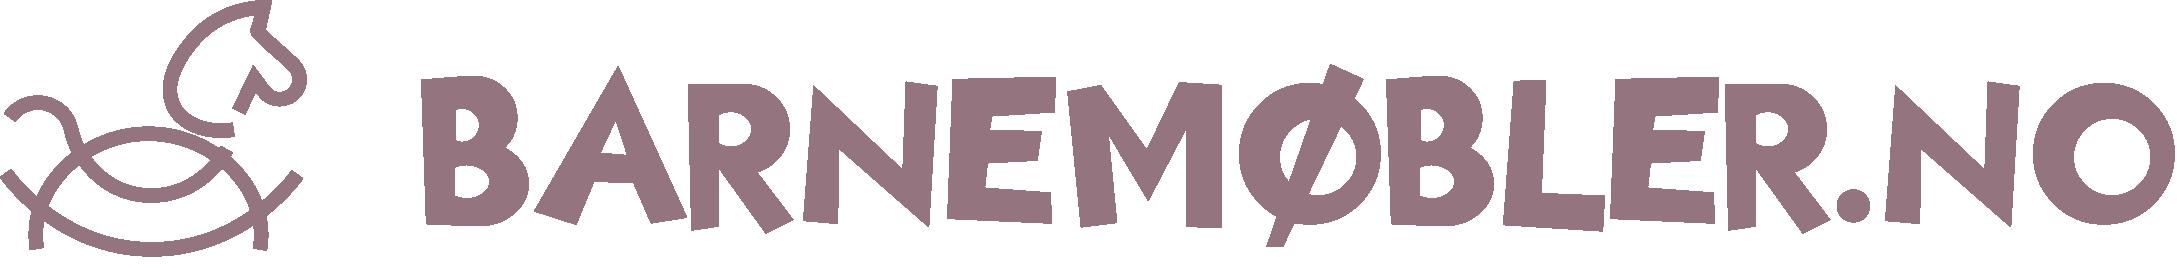 Barnemobler Logo